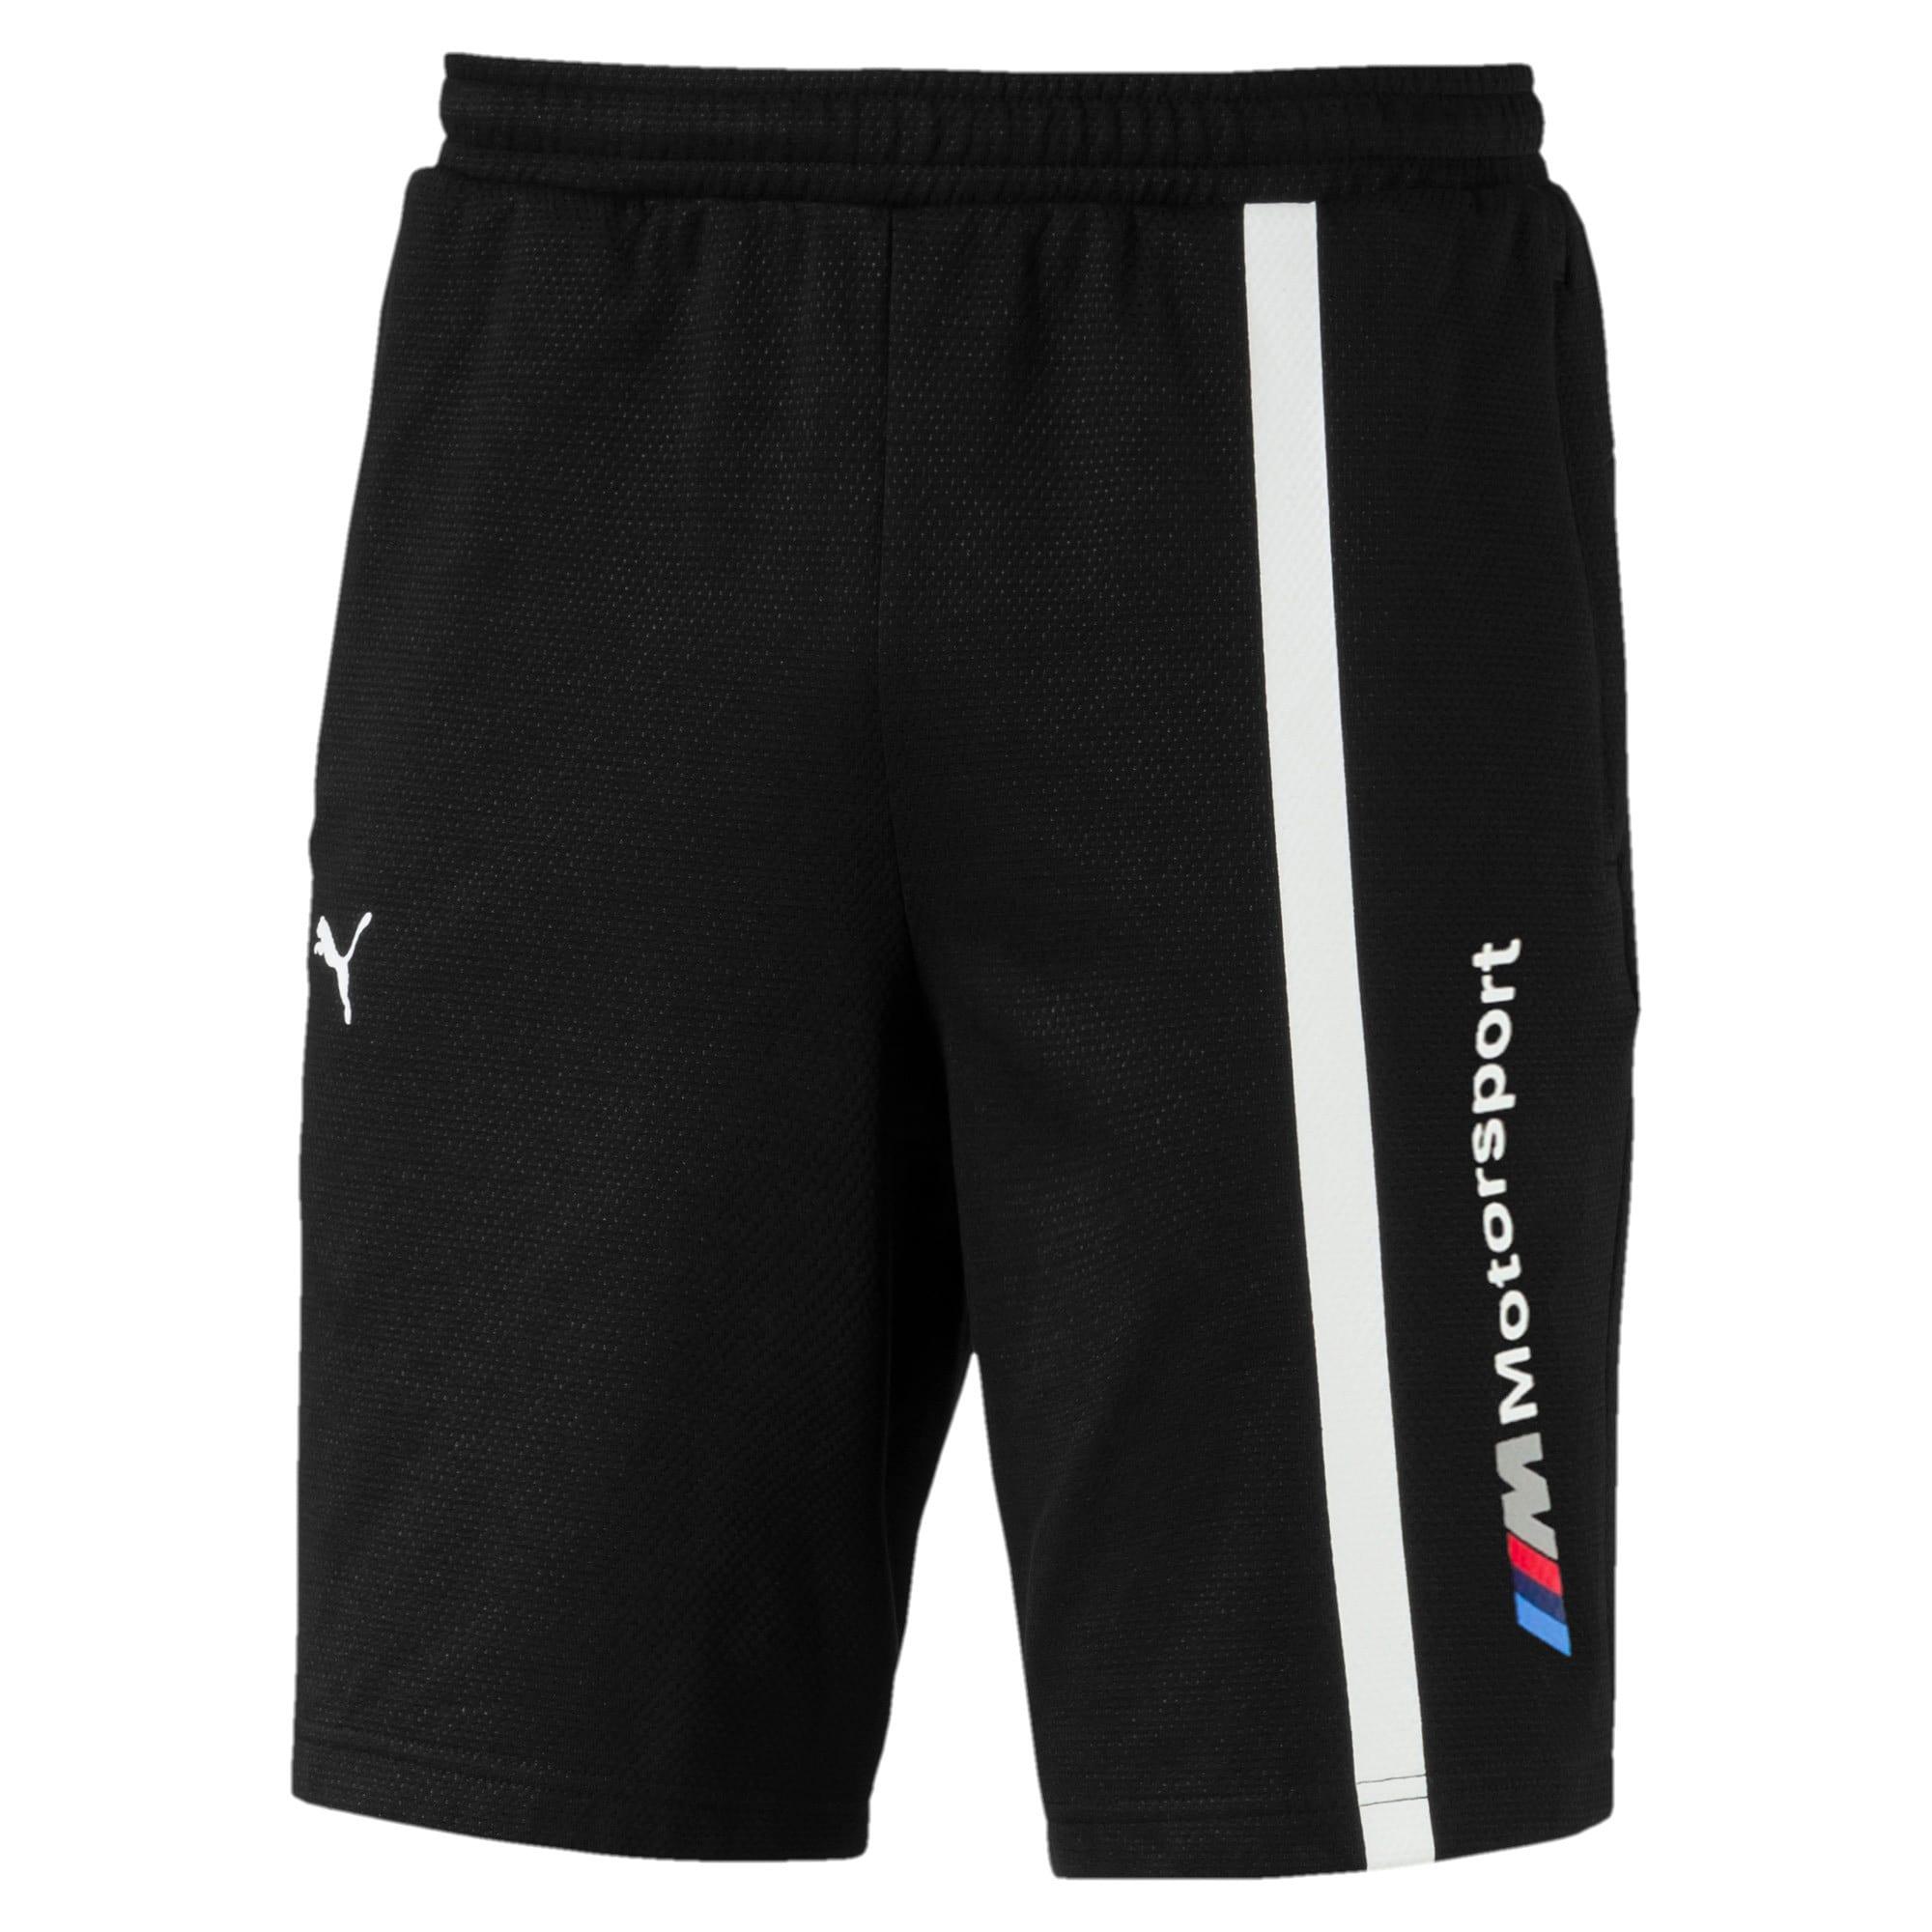 Miniatura 4 de Shorts deportivos BMW M Motorsport para hombre, Puma Black, mediano